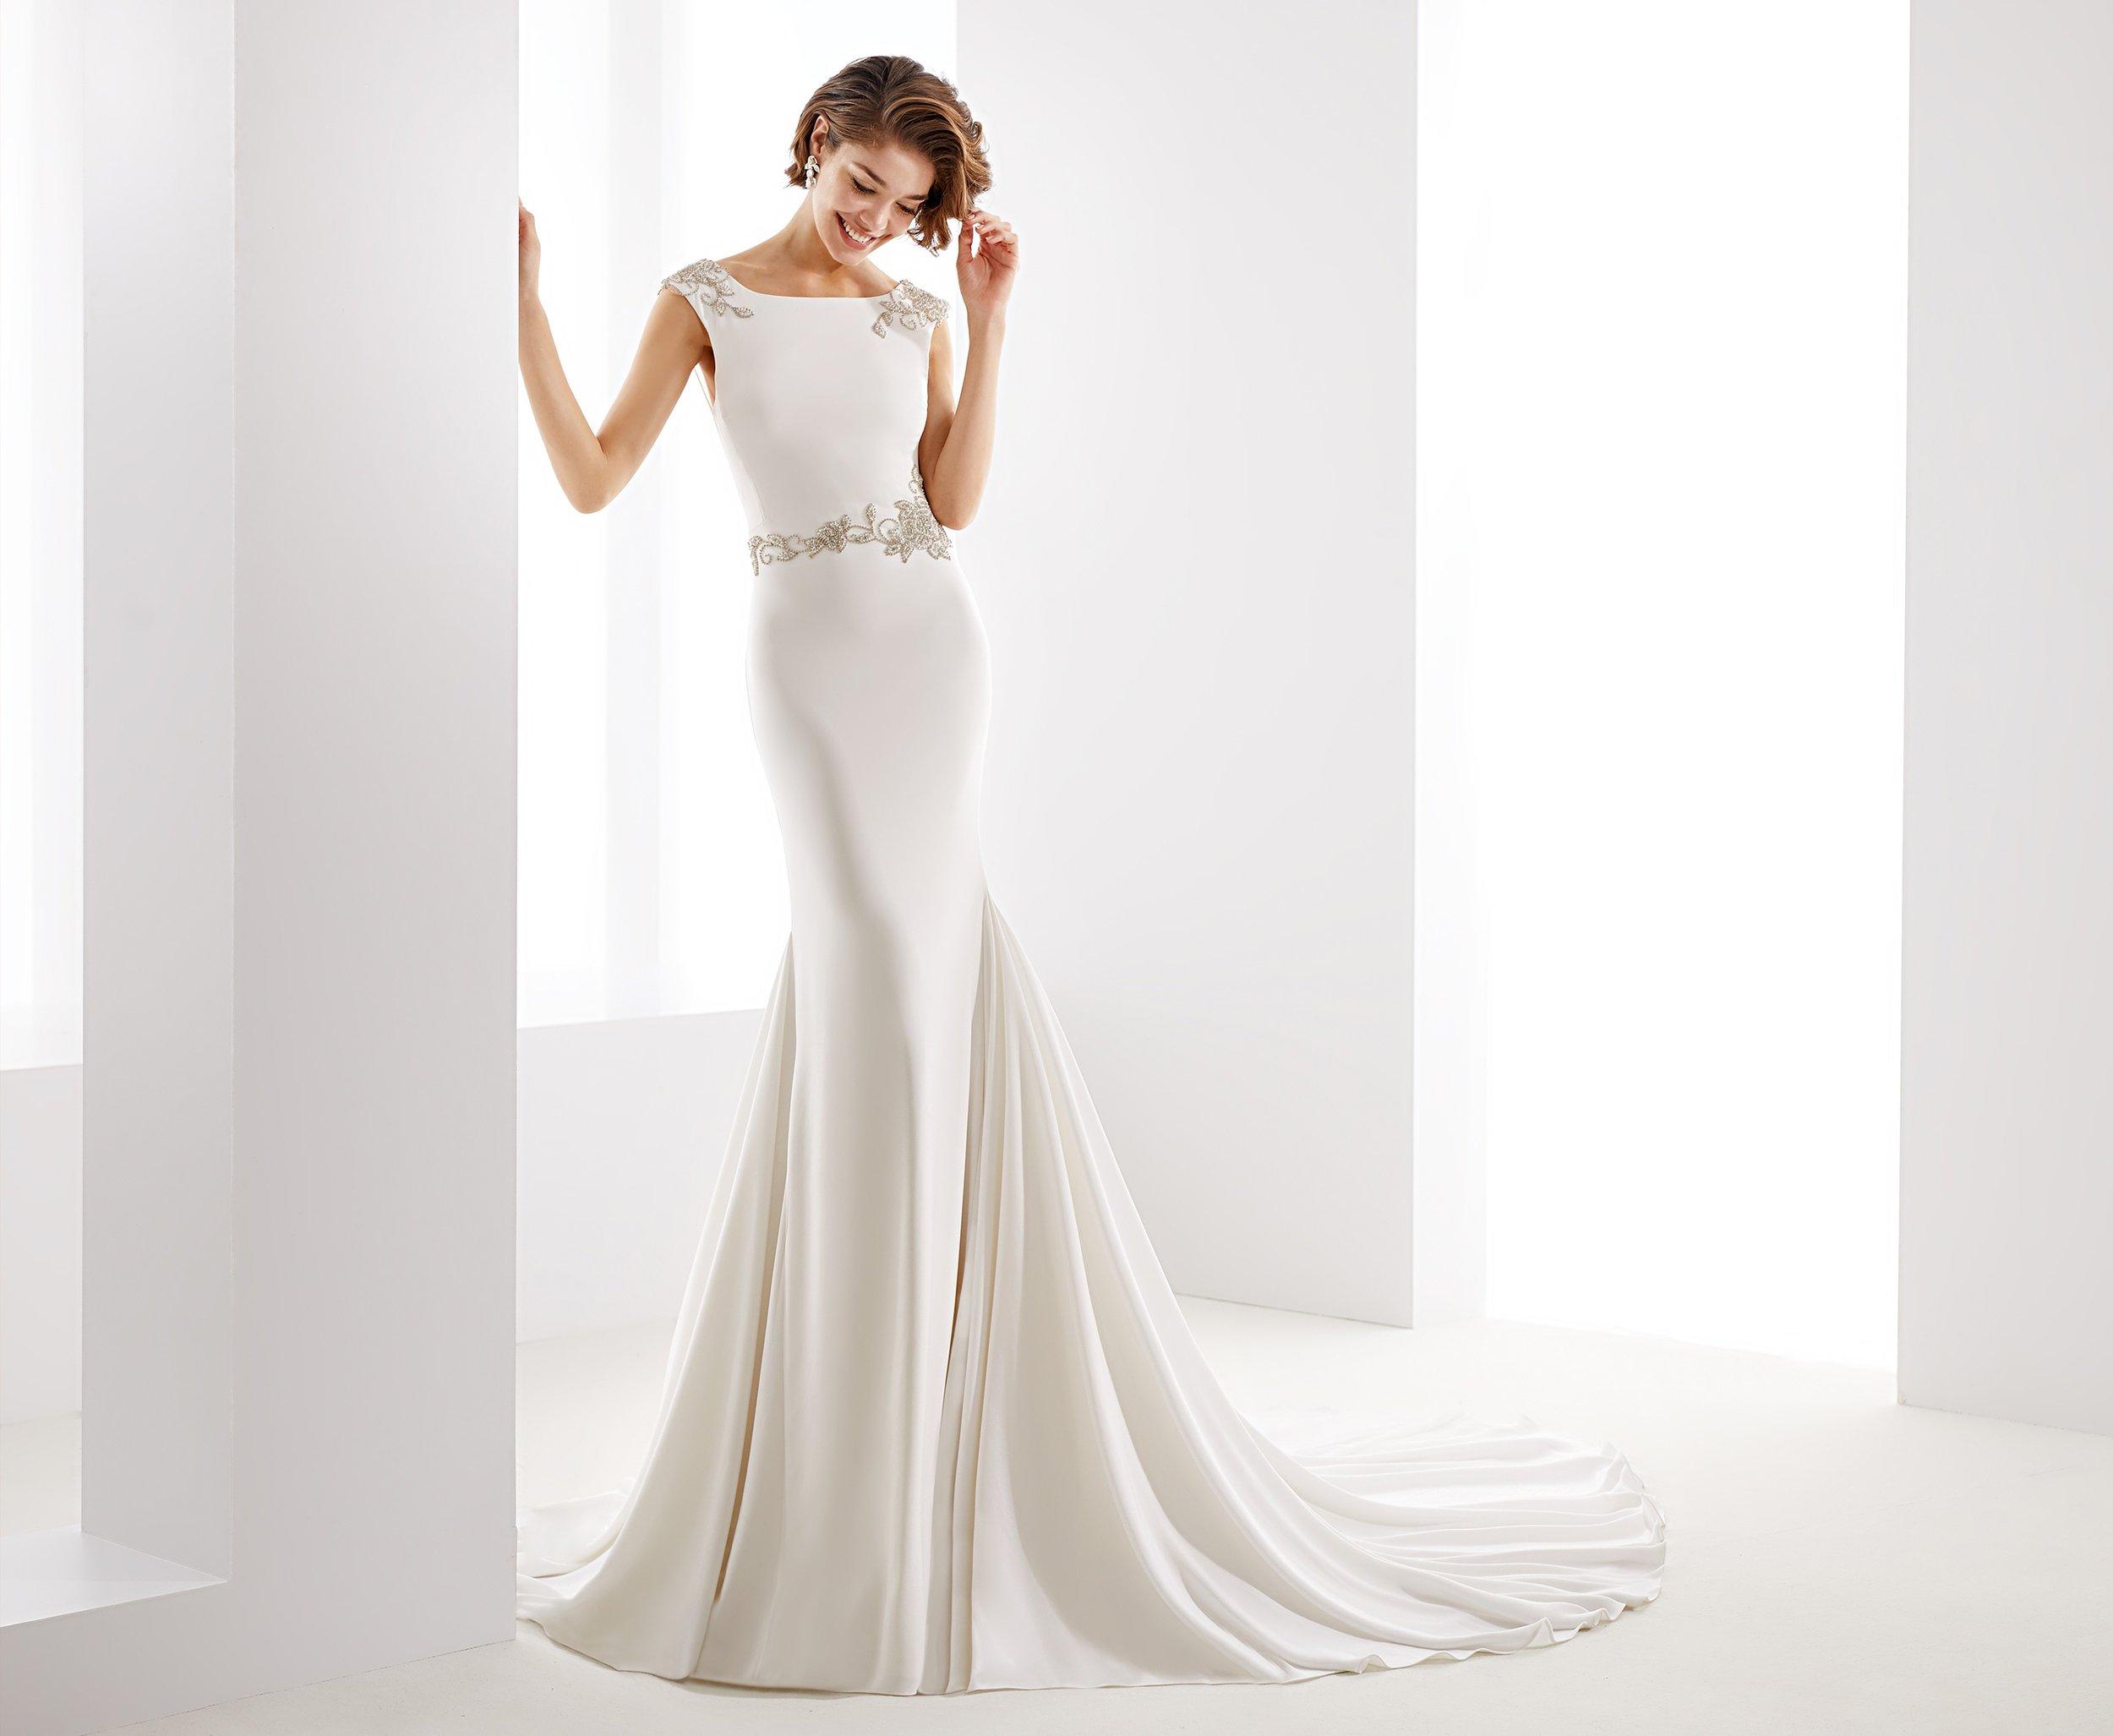 nicole-spose-JOAB19506-Jolies-moda-sposa-2019-312.jpg